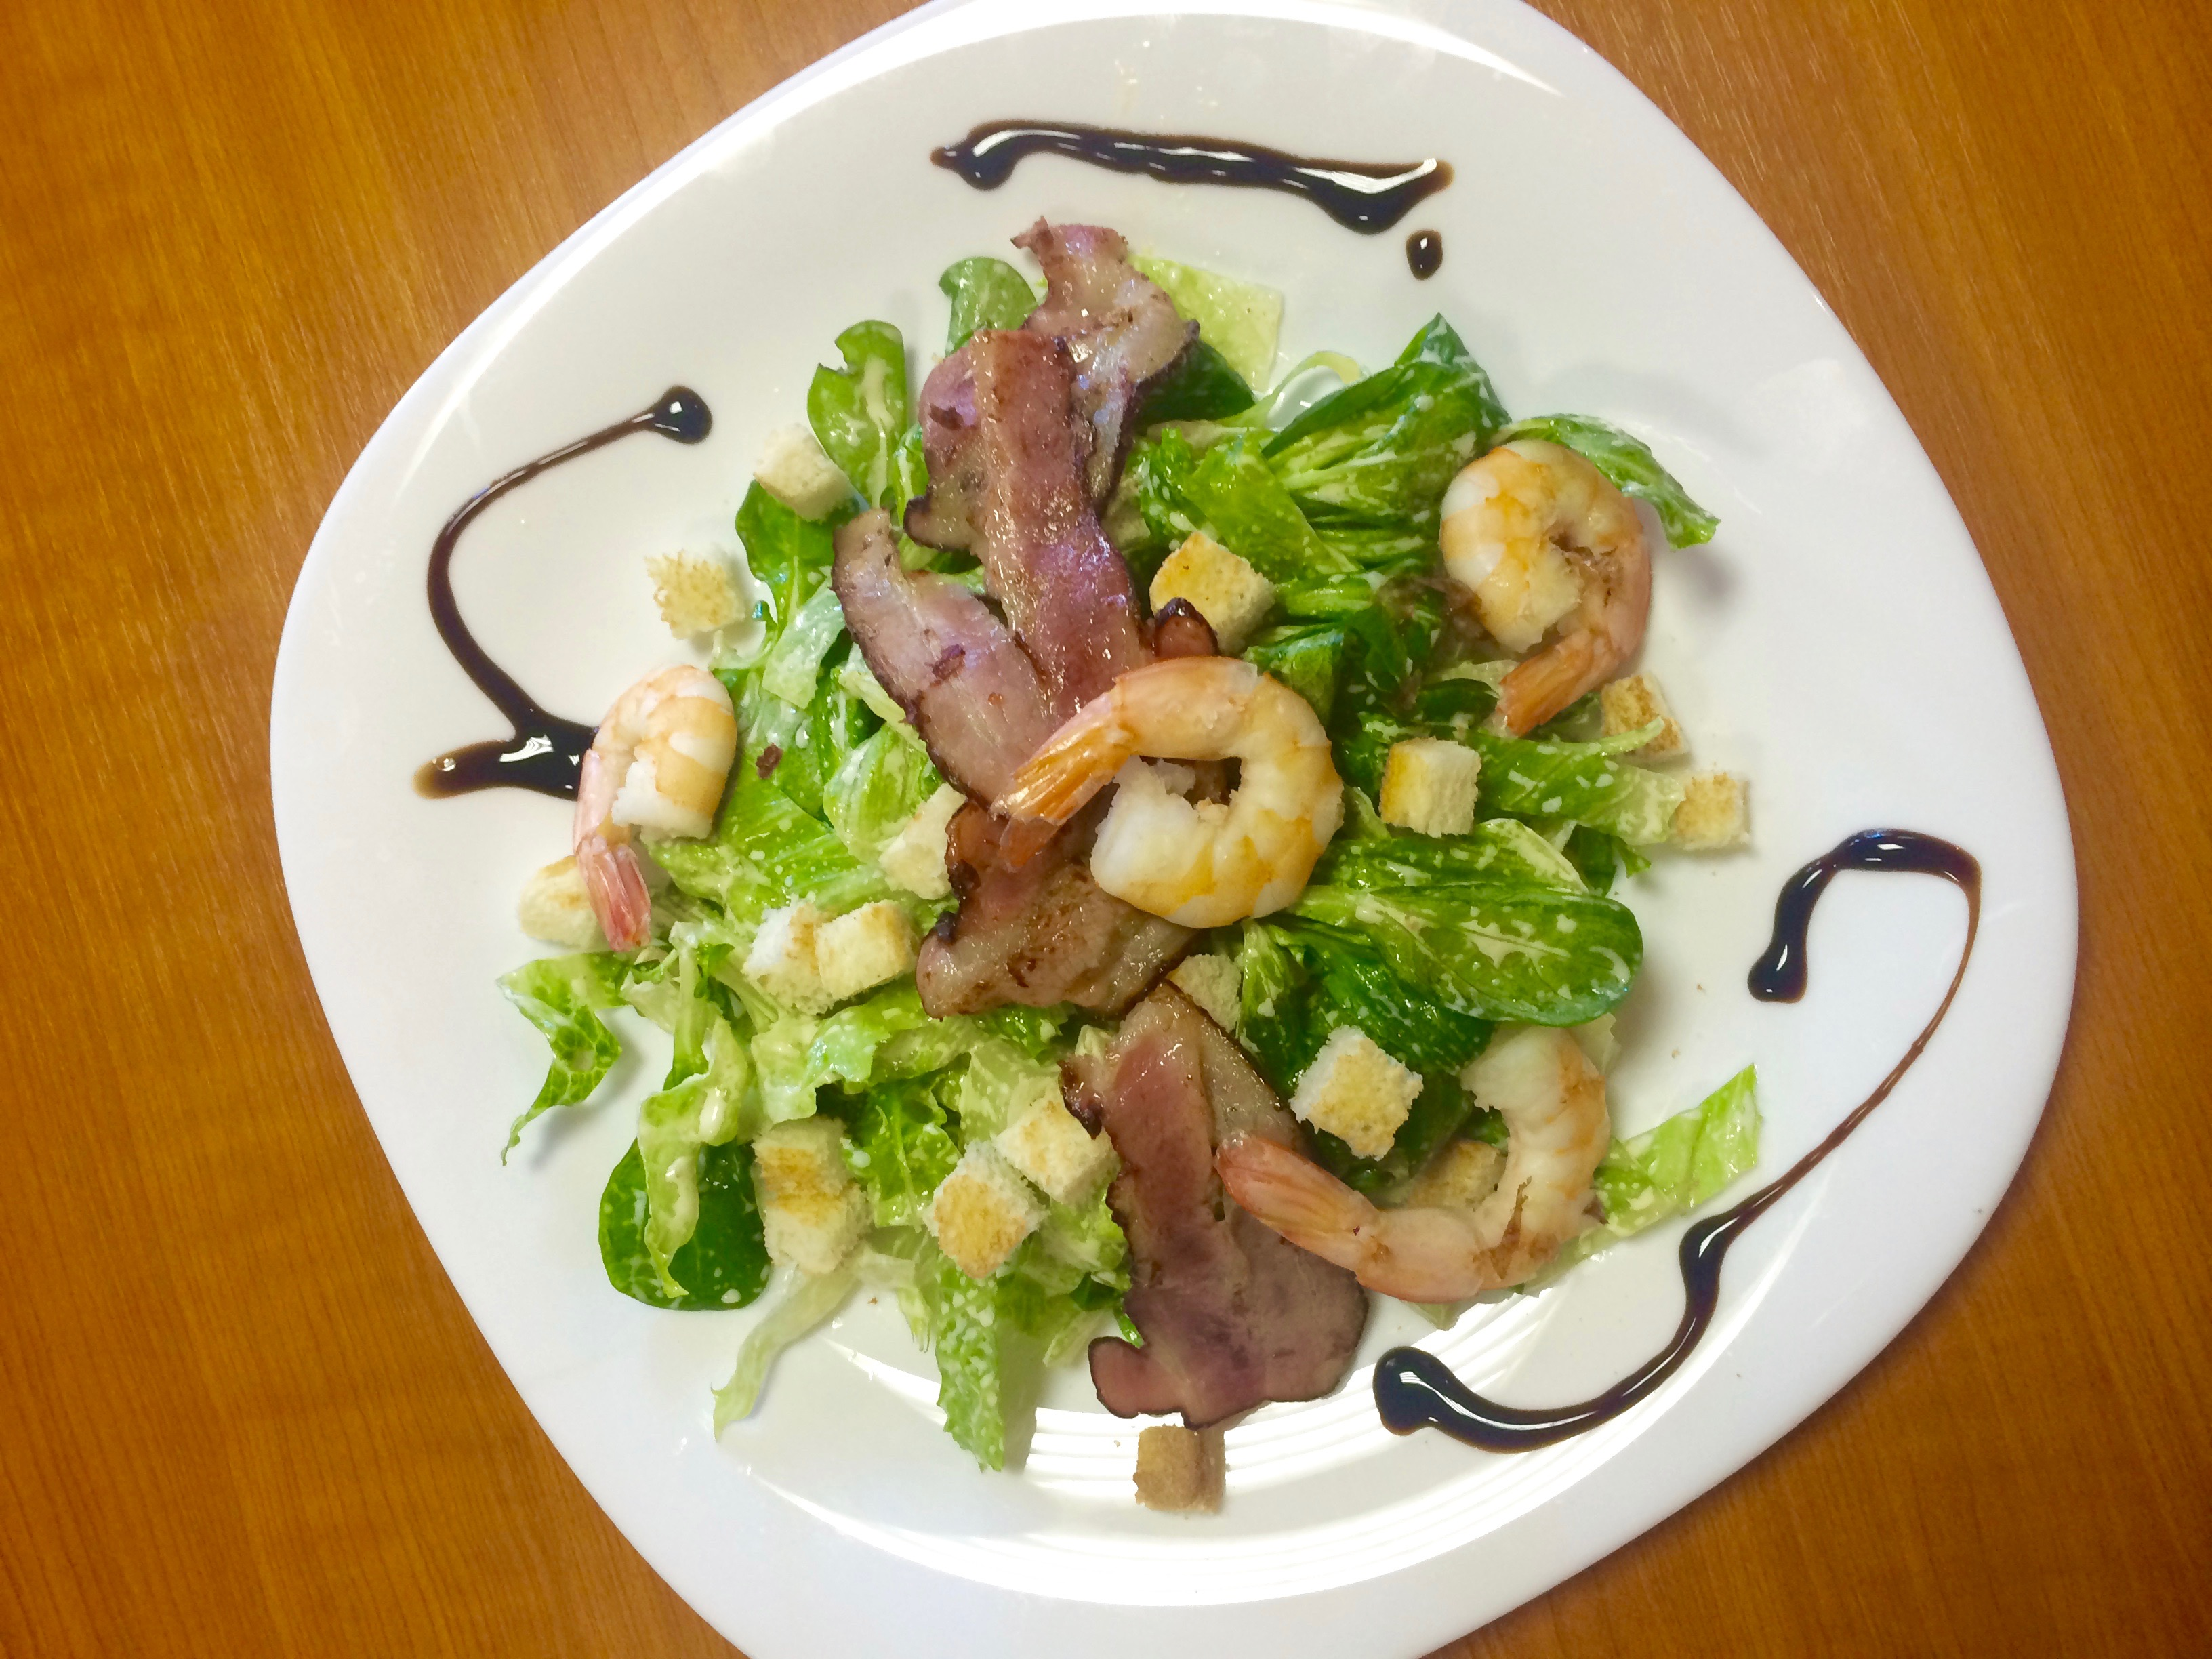 Vinoporatugal Caesar salat blog